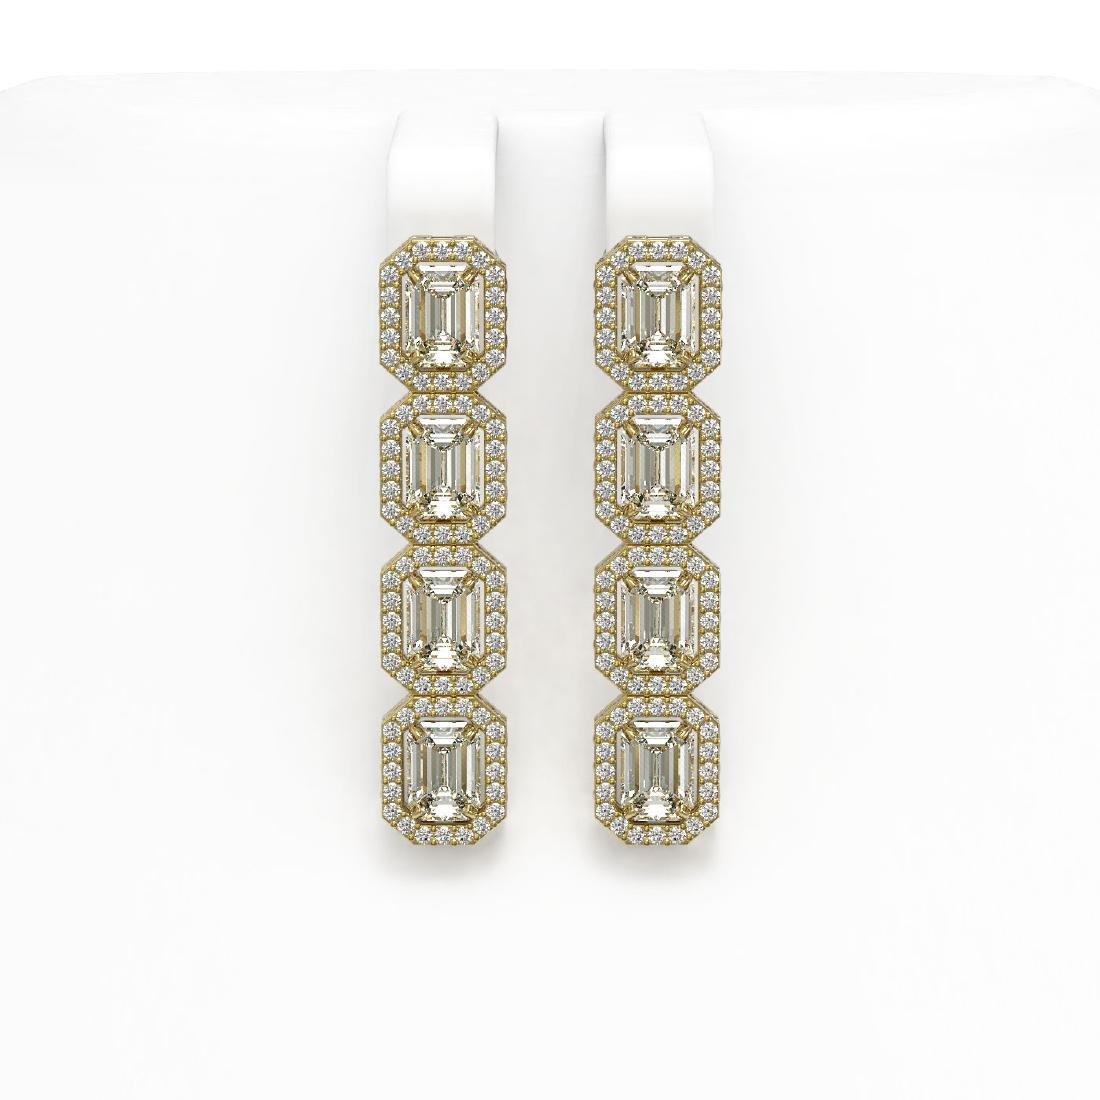 6.08 CTW Emerald Cut Diamond Designer Earrings 18K